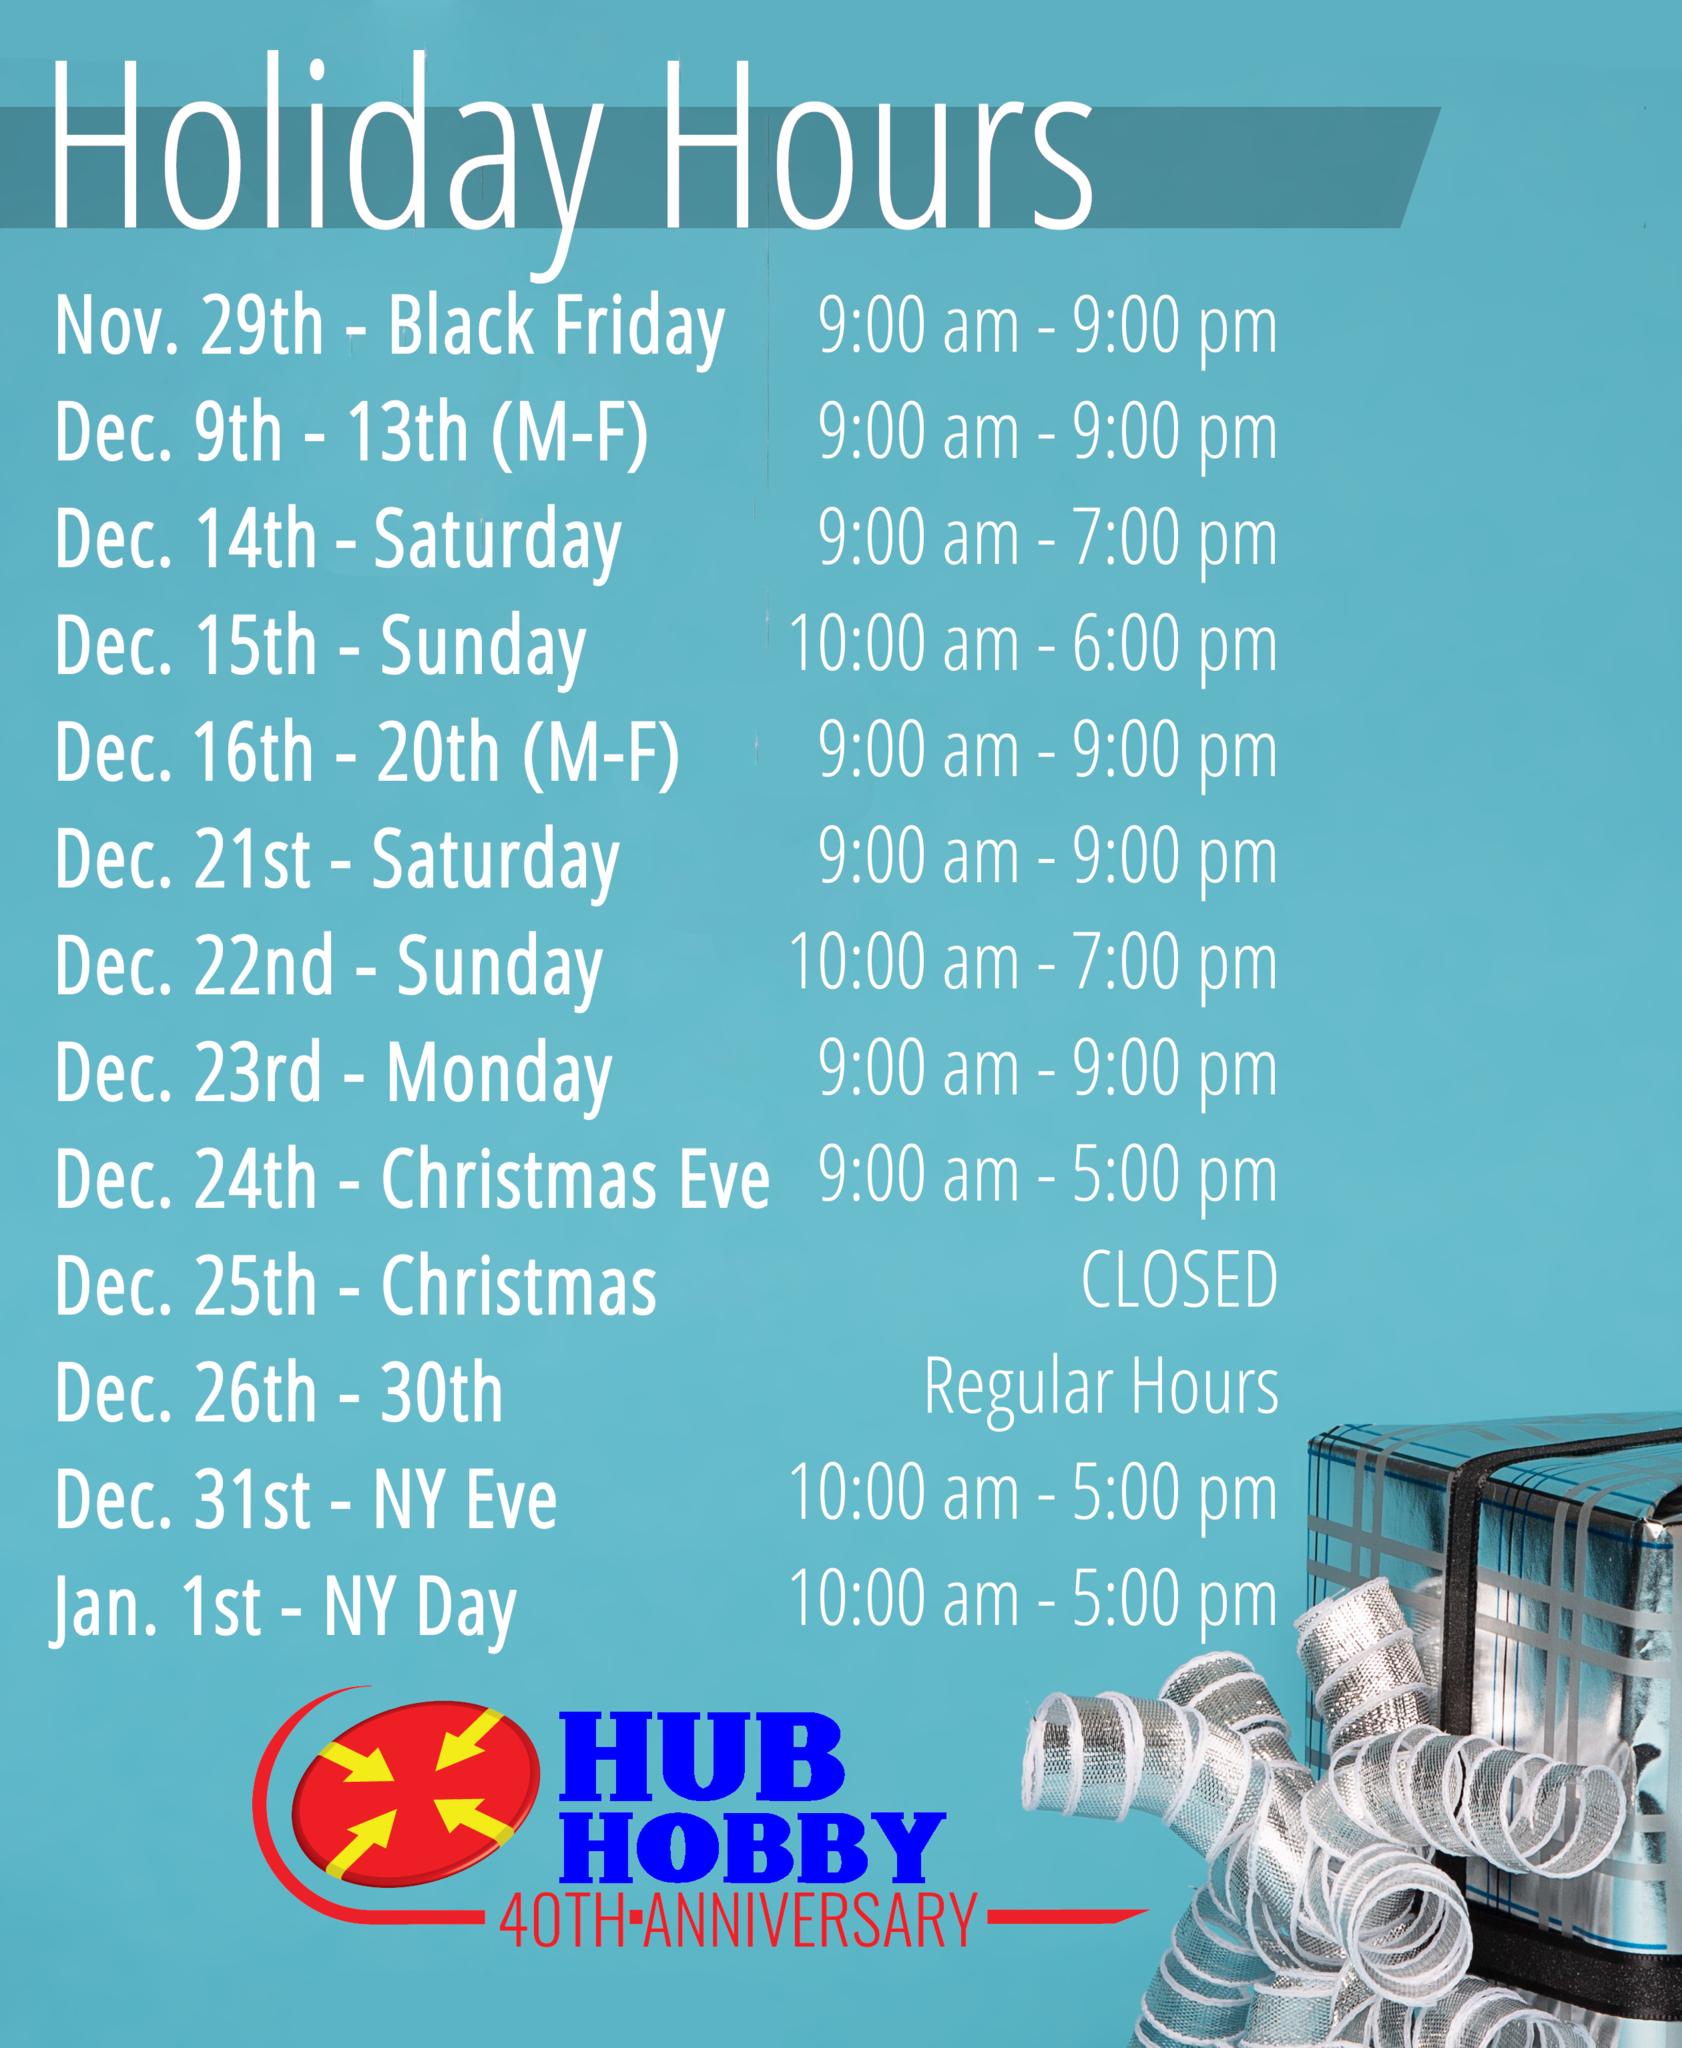 Hub Hobby Holiday Hours 2019